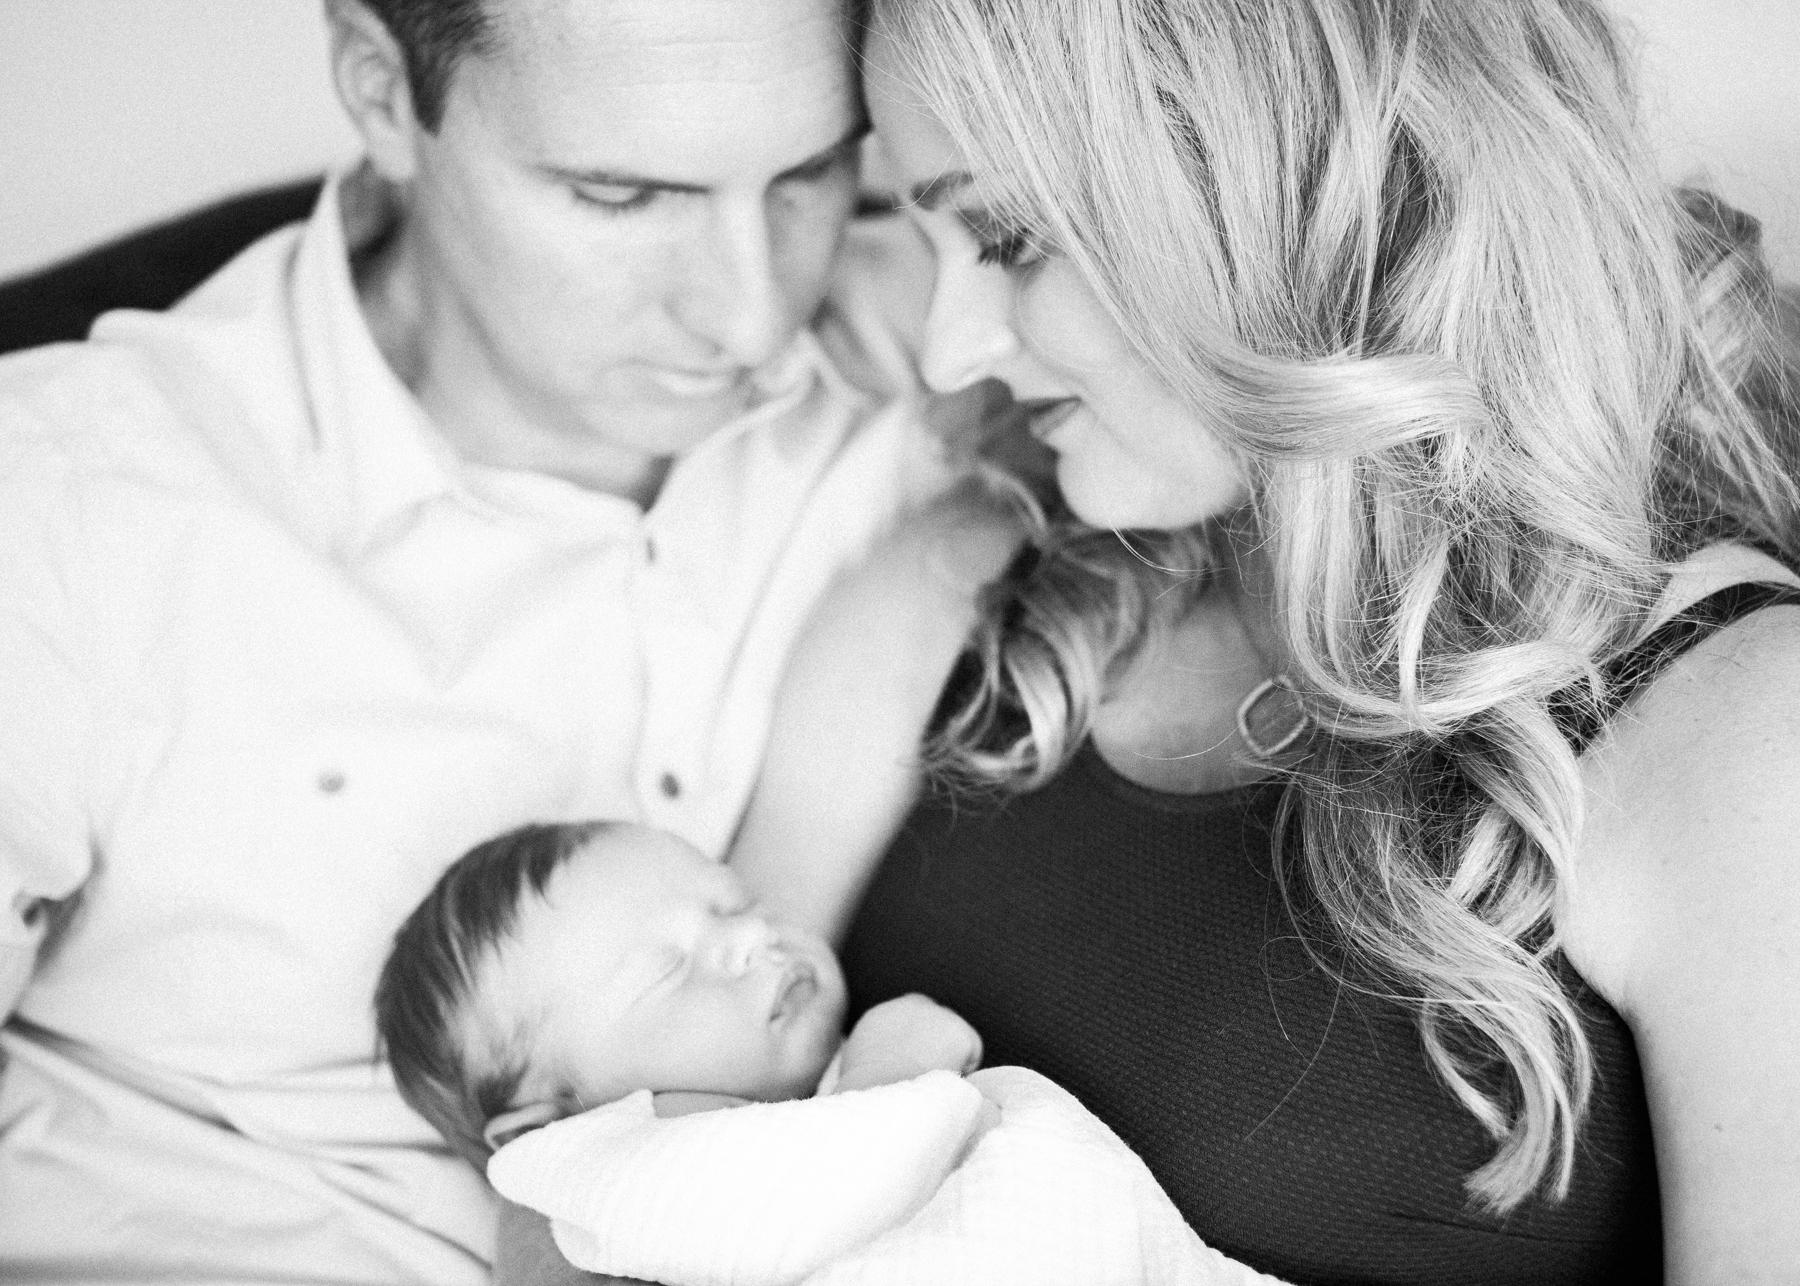 san-diego-newborn-photography-5.jpg